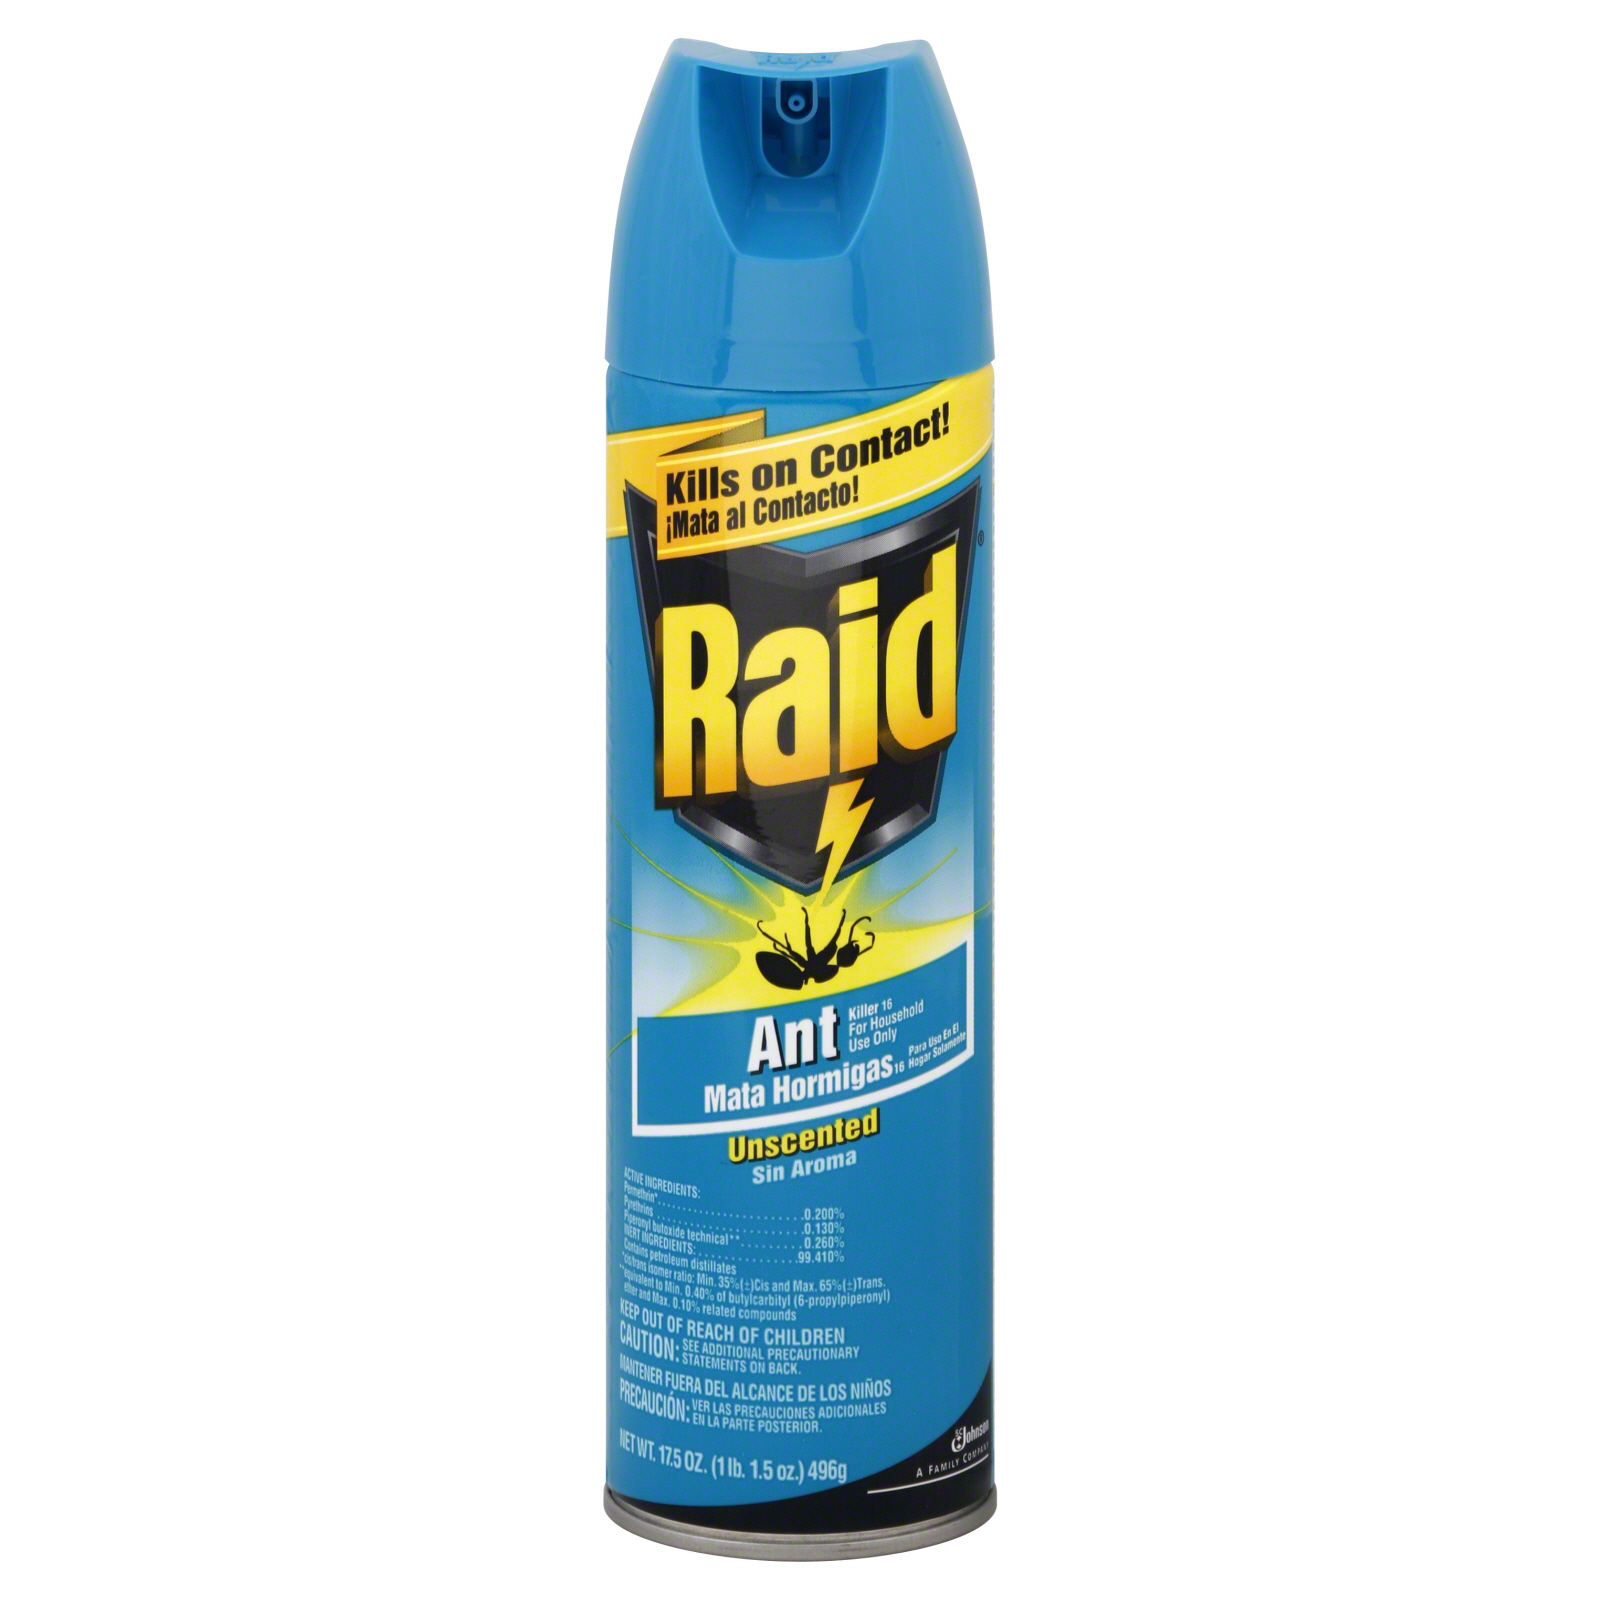 Raid Ant Killer 16 Unscented 175 oz 1 lb 15 oz 496 g